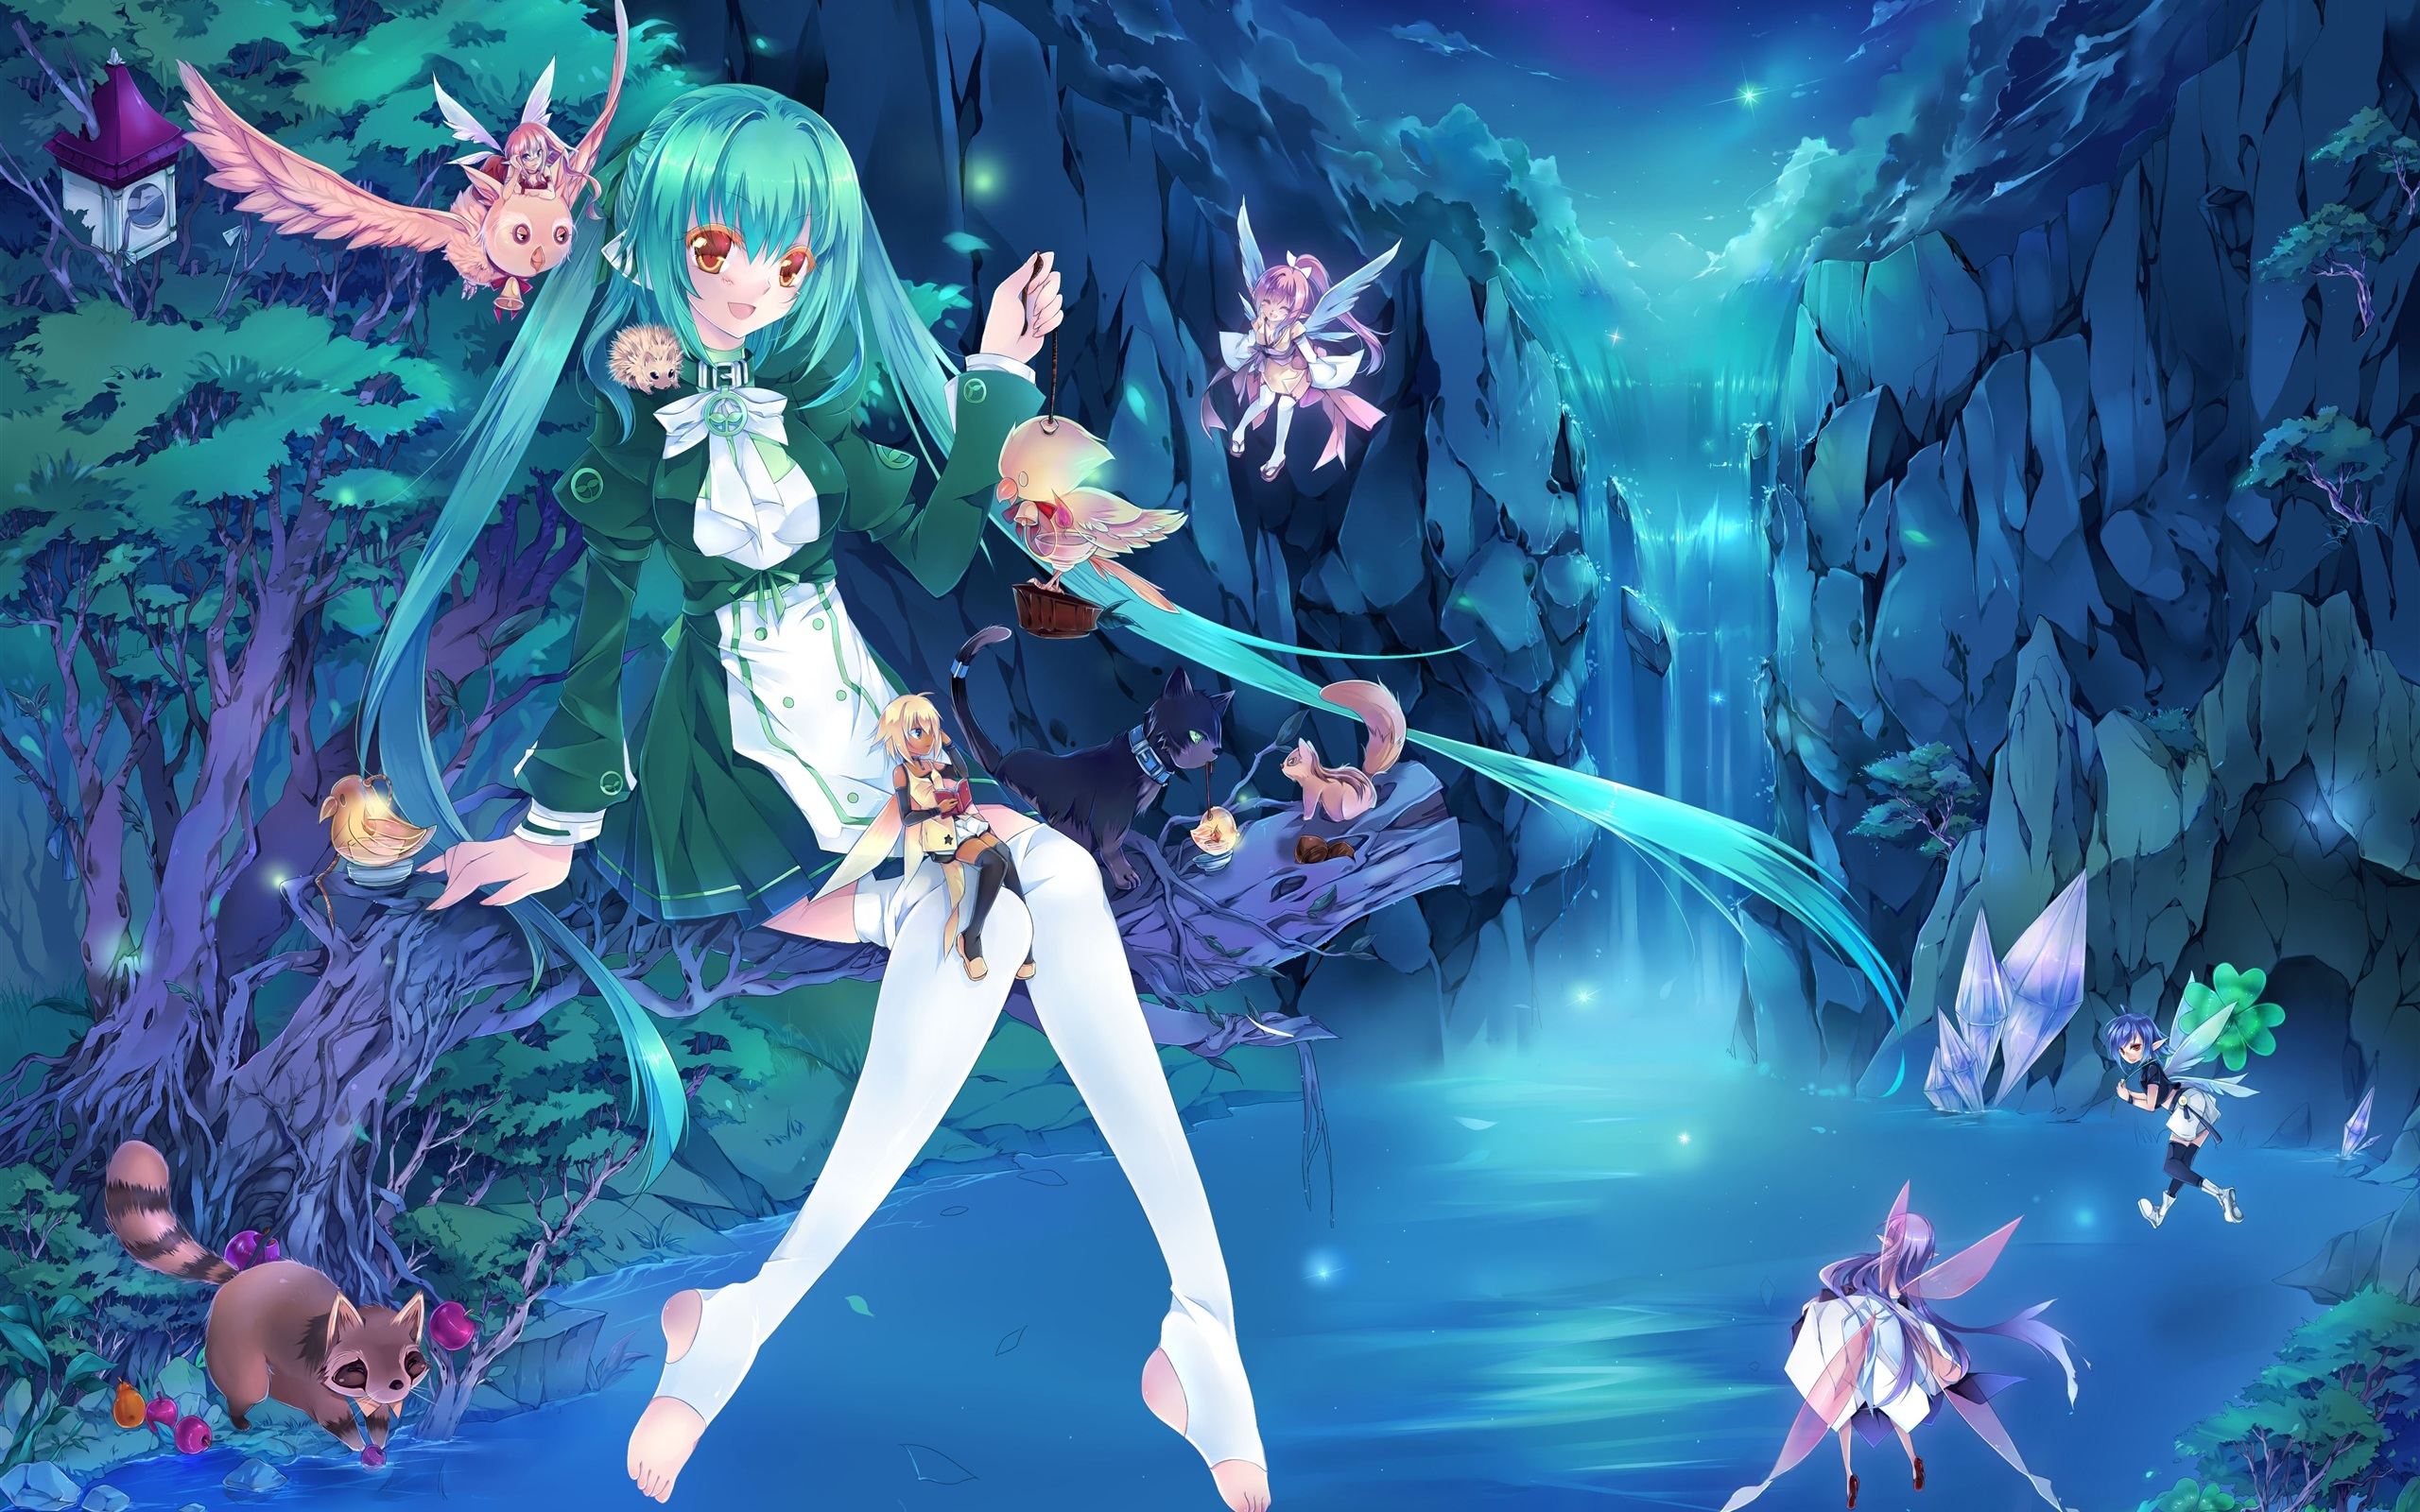 Wallpaper Blue Hair Anime Girl Fairies Waterfall Light